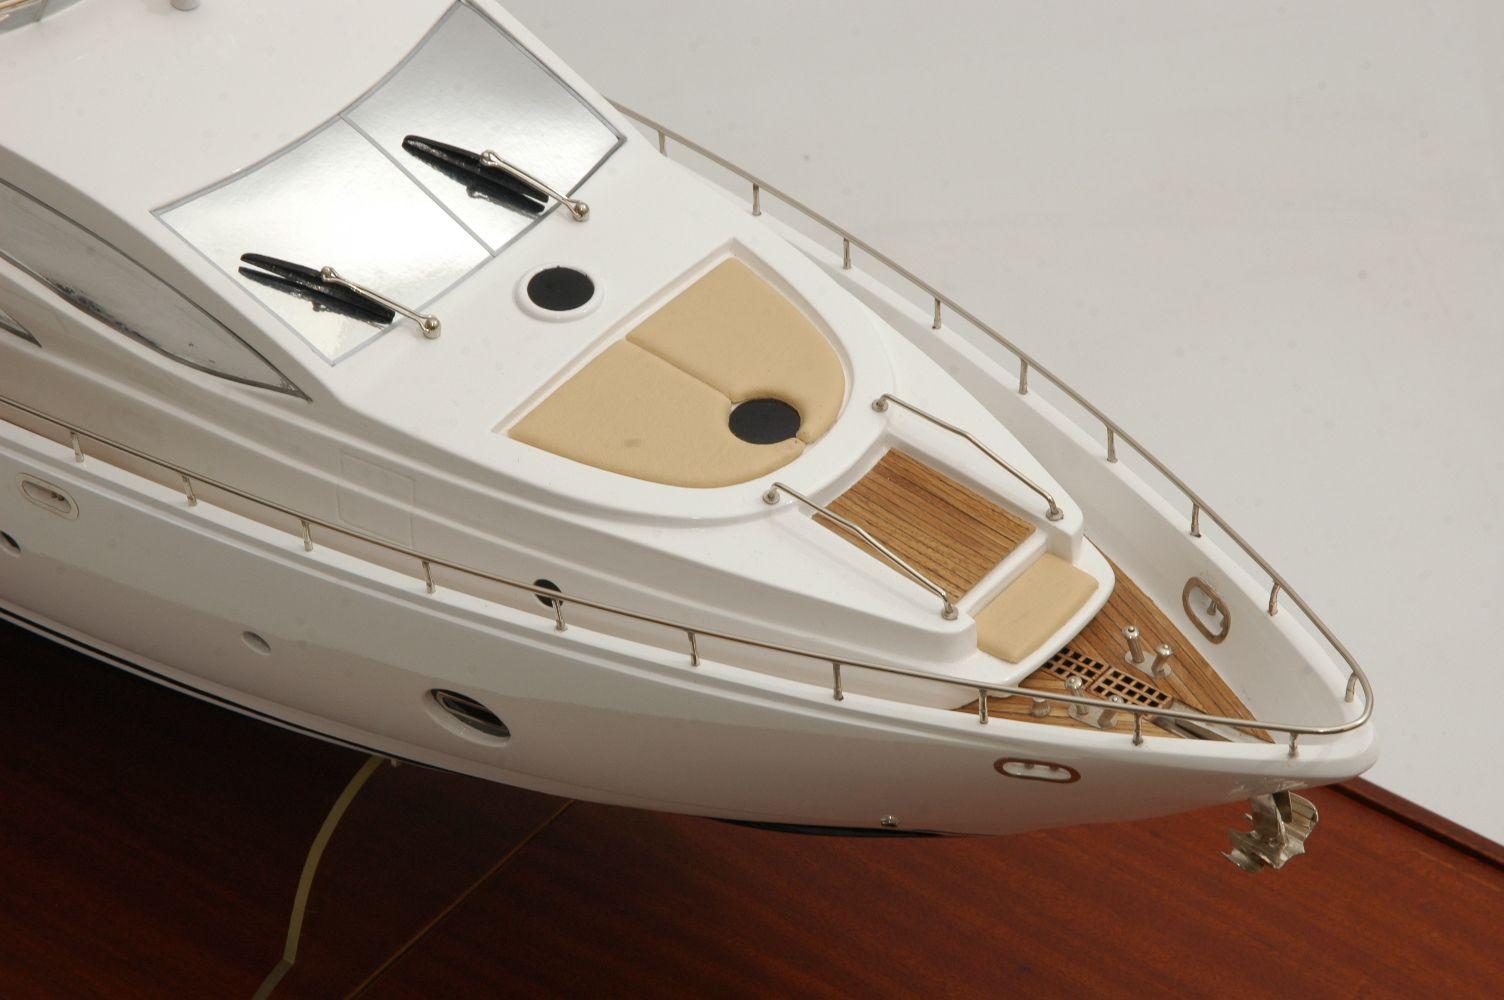 1333-6875-Aicon-Fly-85-Yacht-Premier-Range